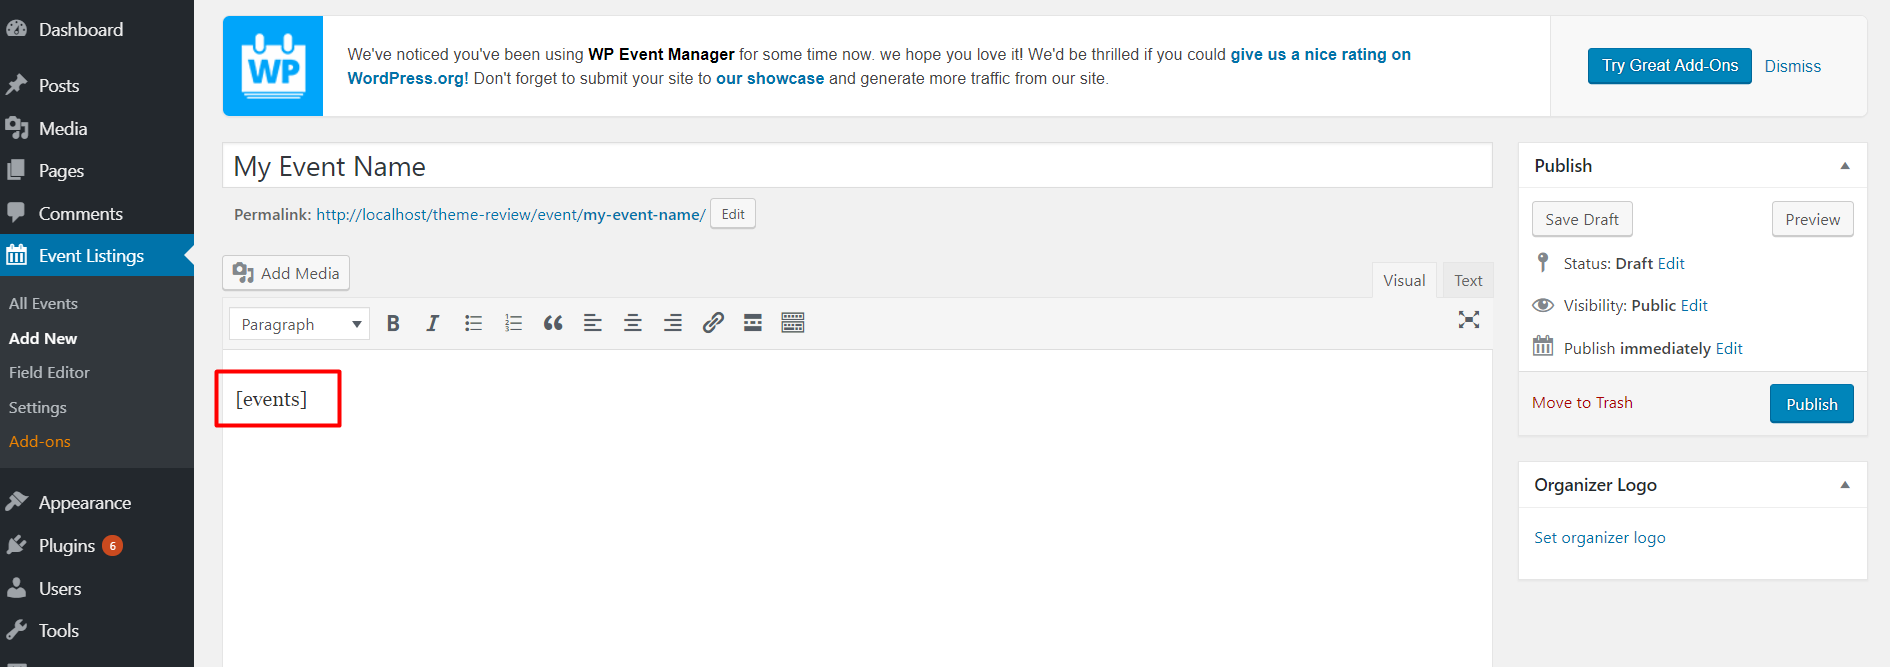 WordPress Event Management Plugin